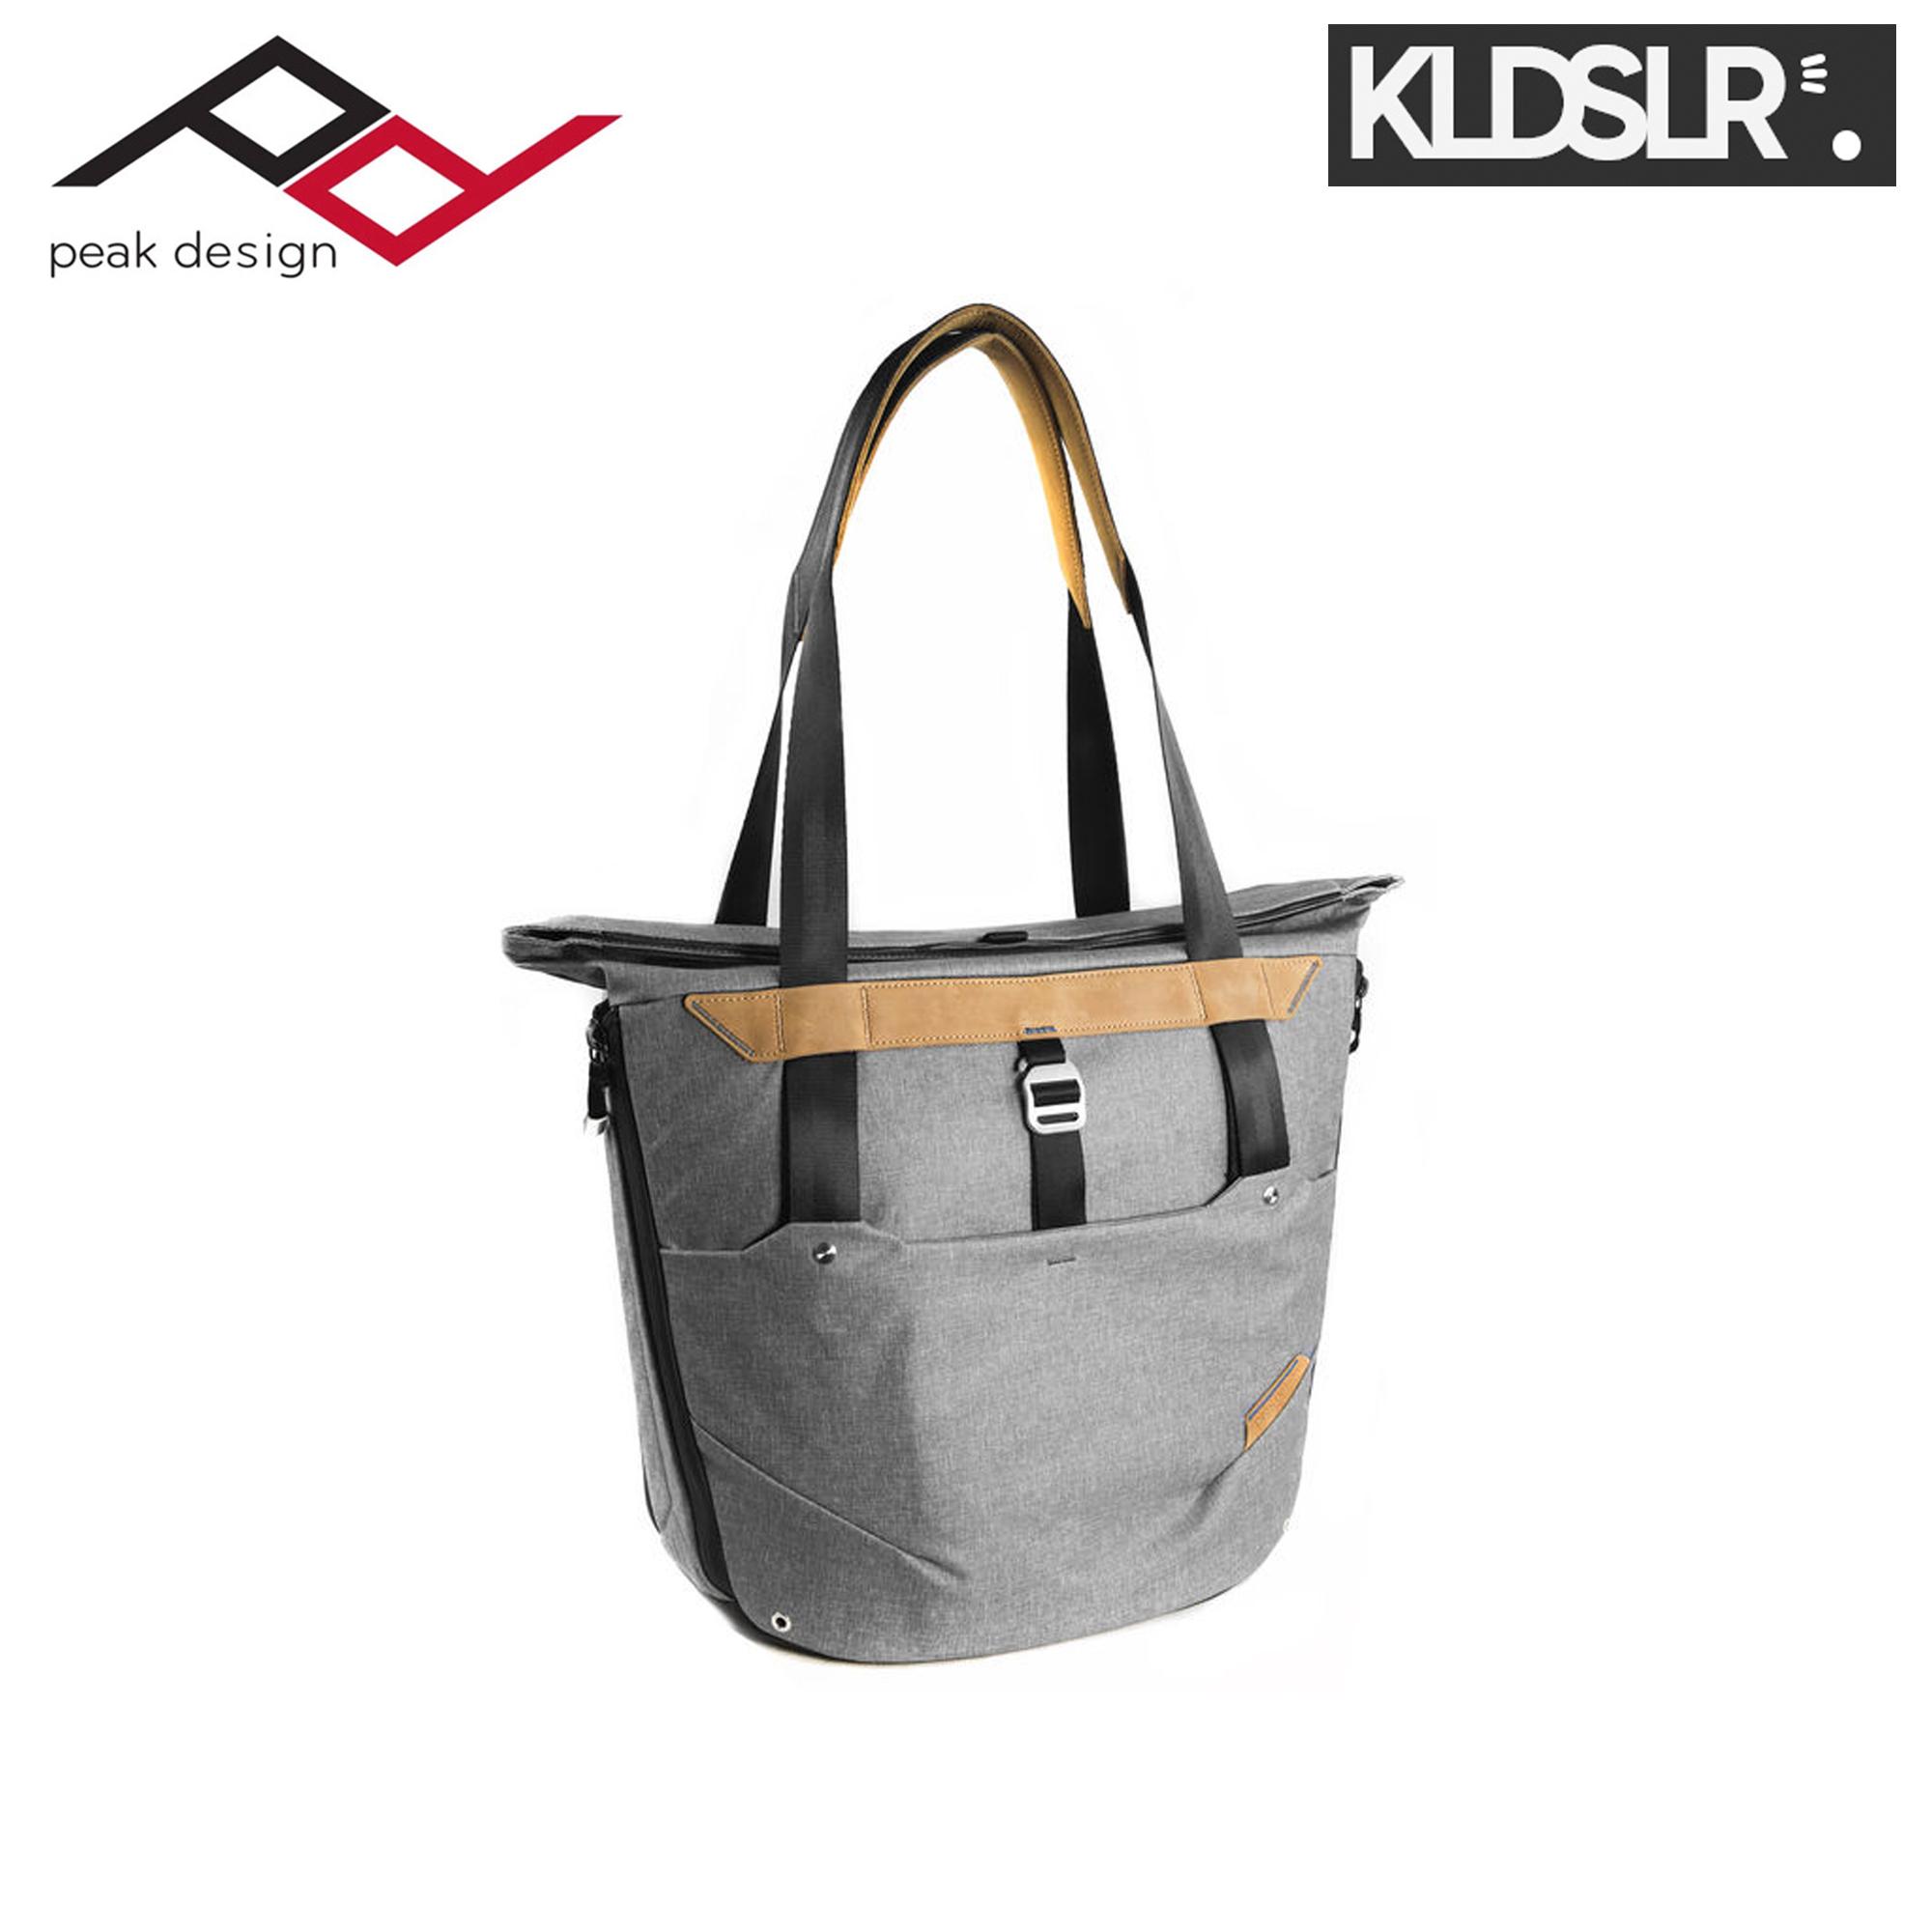 Ready Stock Peak Design Everyday Tote Bag Ash Bt 20 As 1 Lens Kit Nikon F Mount